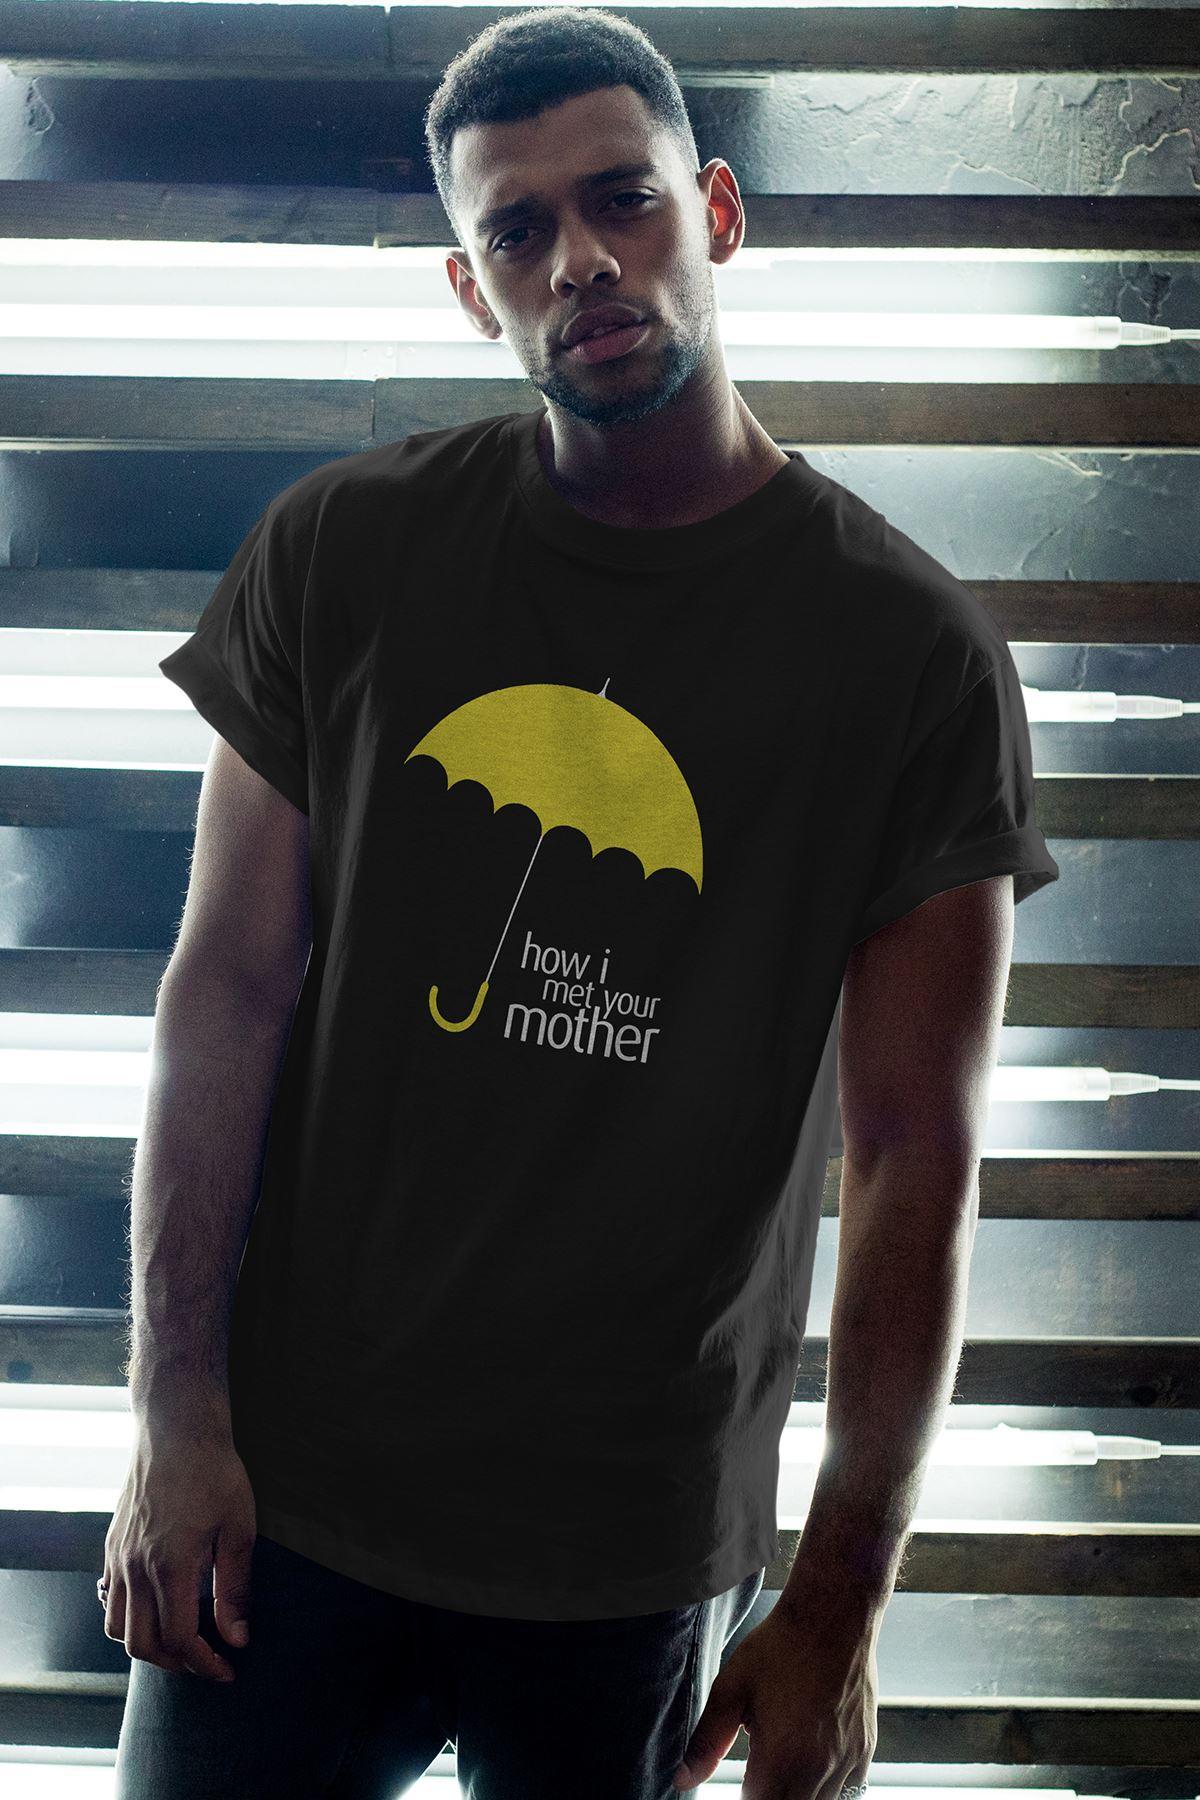 Meet Mother 03 Siyah Erkek Oversize Tshirt - Tişört